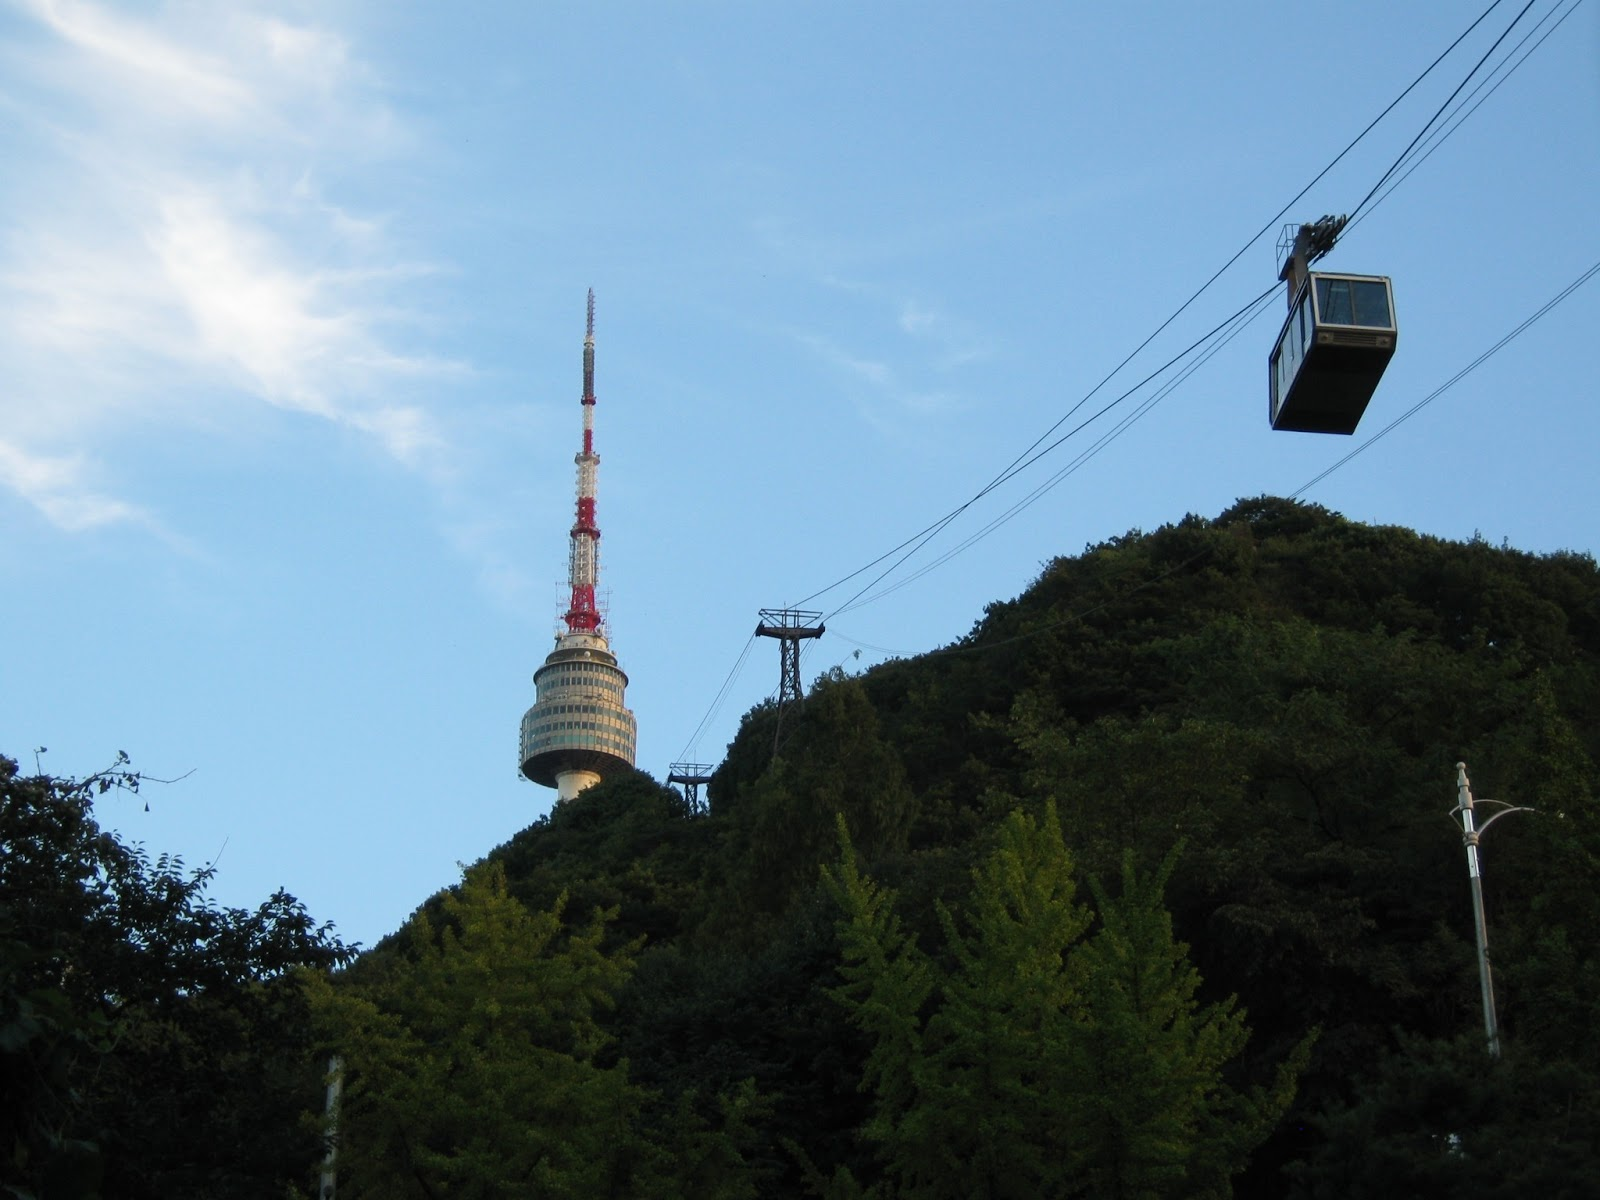 Namsan cable car - Namsan Cable Car